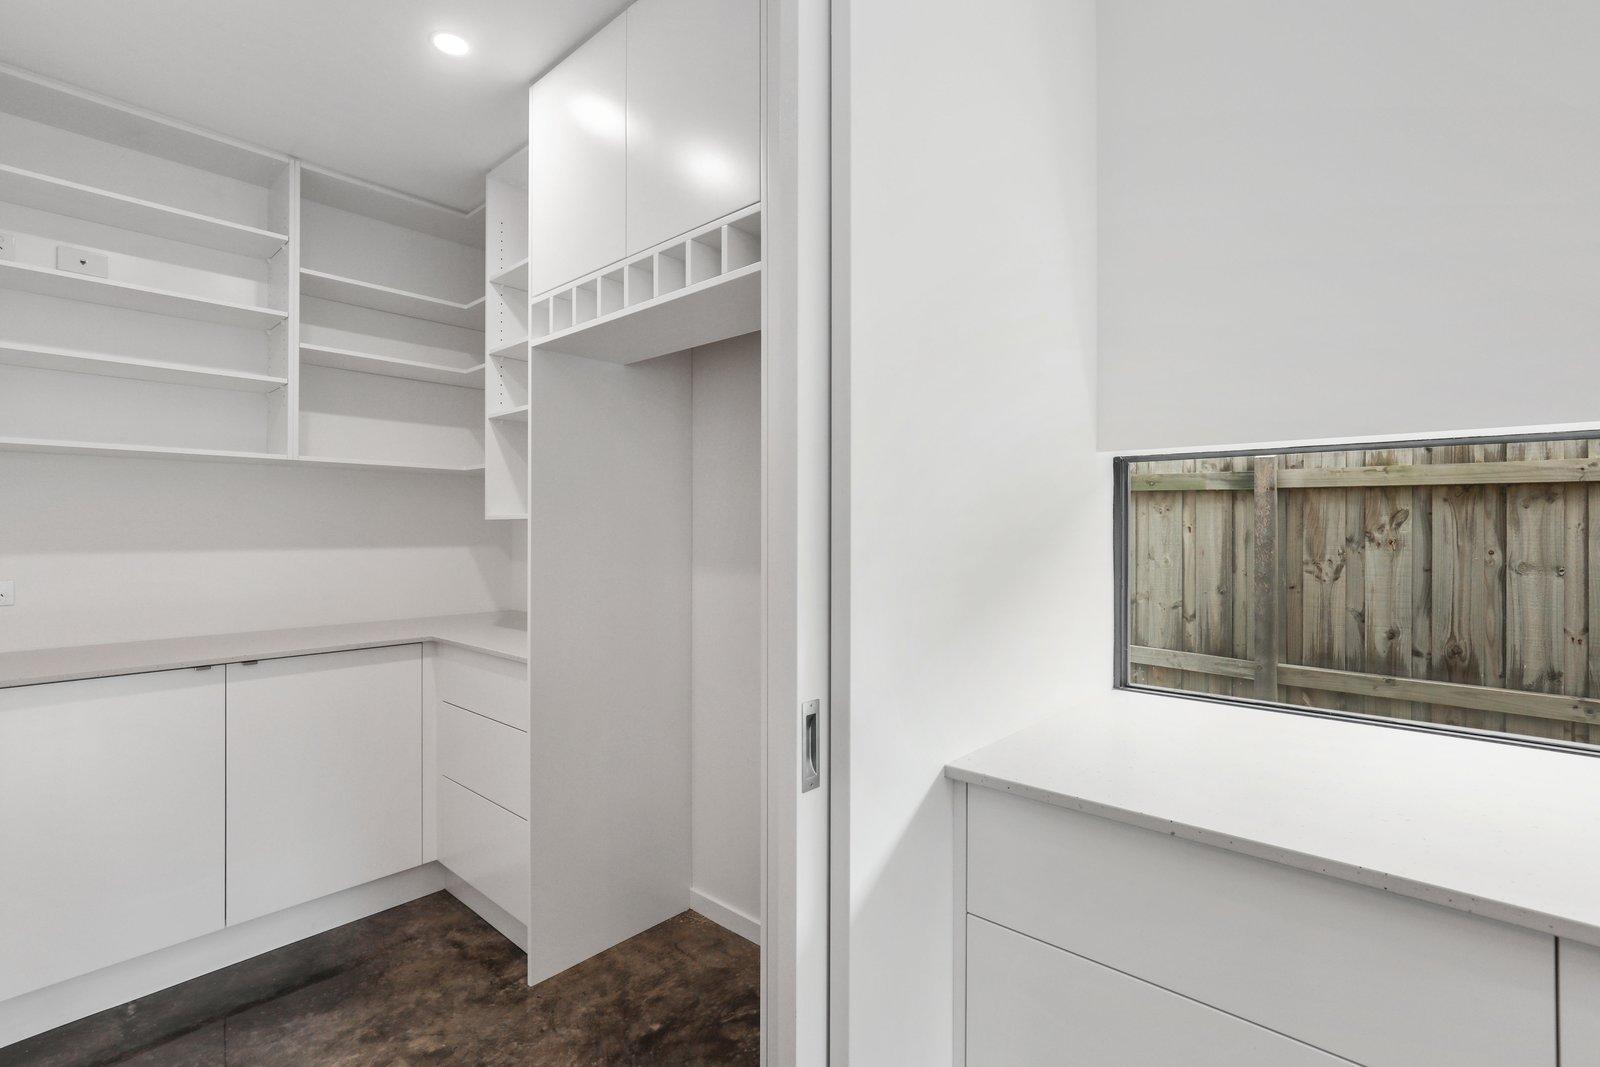 Kitchen, Recessed Lighting, Glass Tile Backsplashe, White Cabinet, Concrete Floor, and Engineered Quartz Counter  Tamara Crecsent by Inverloch 3996